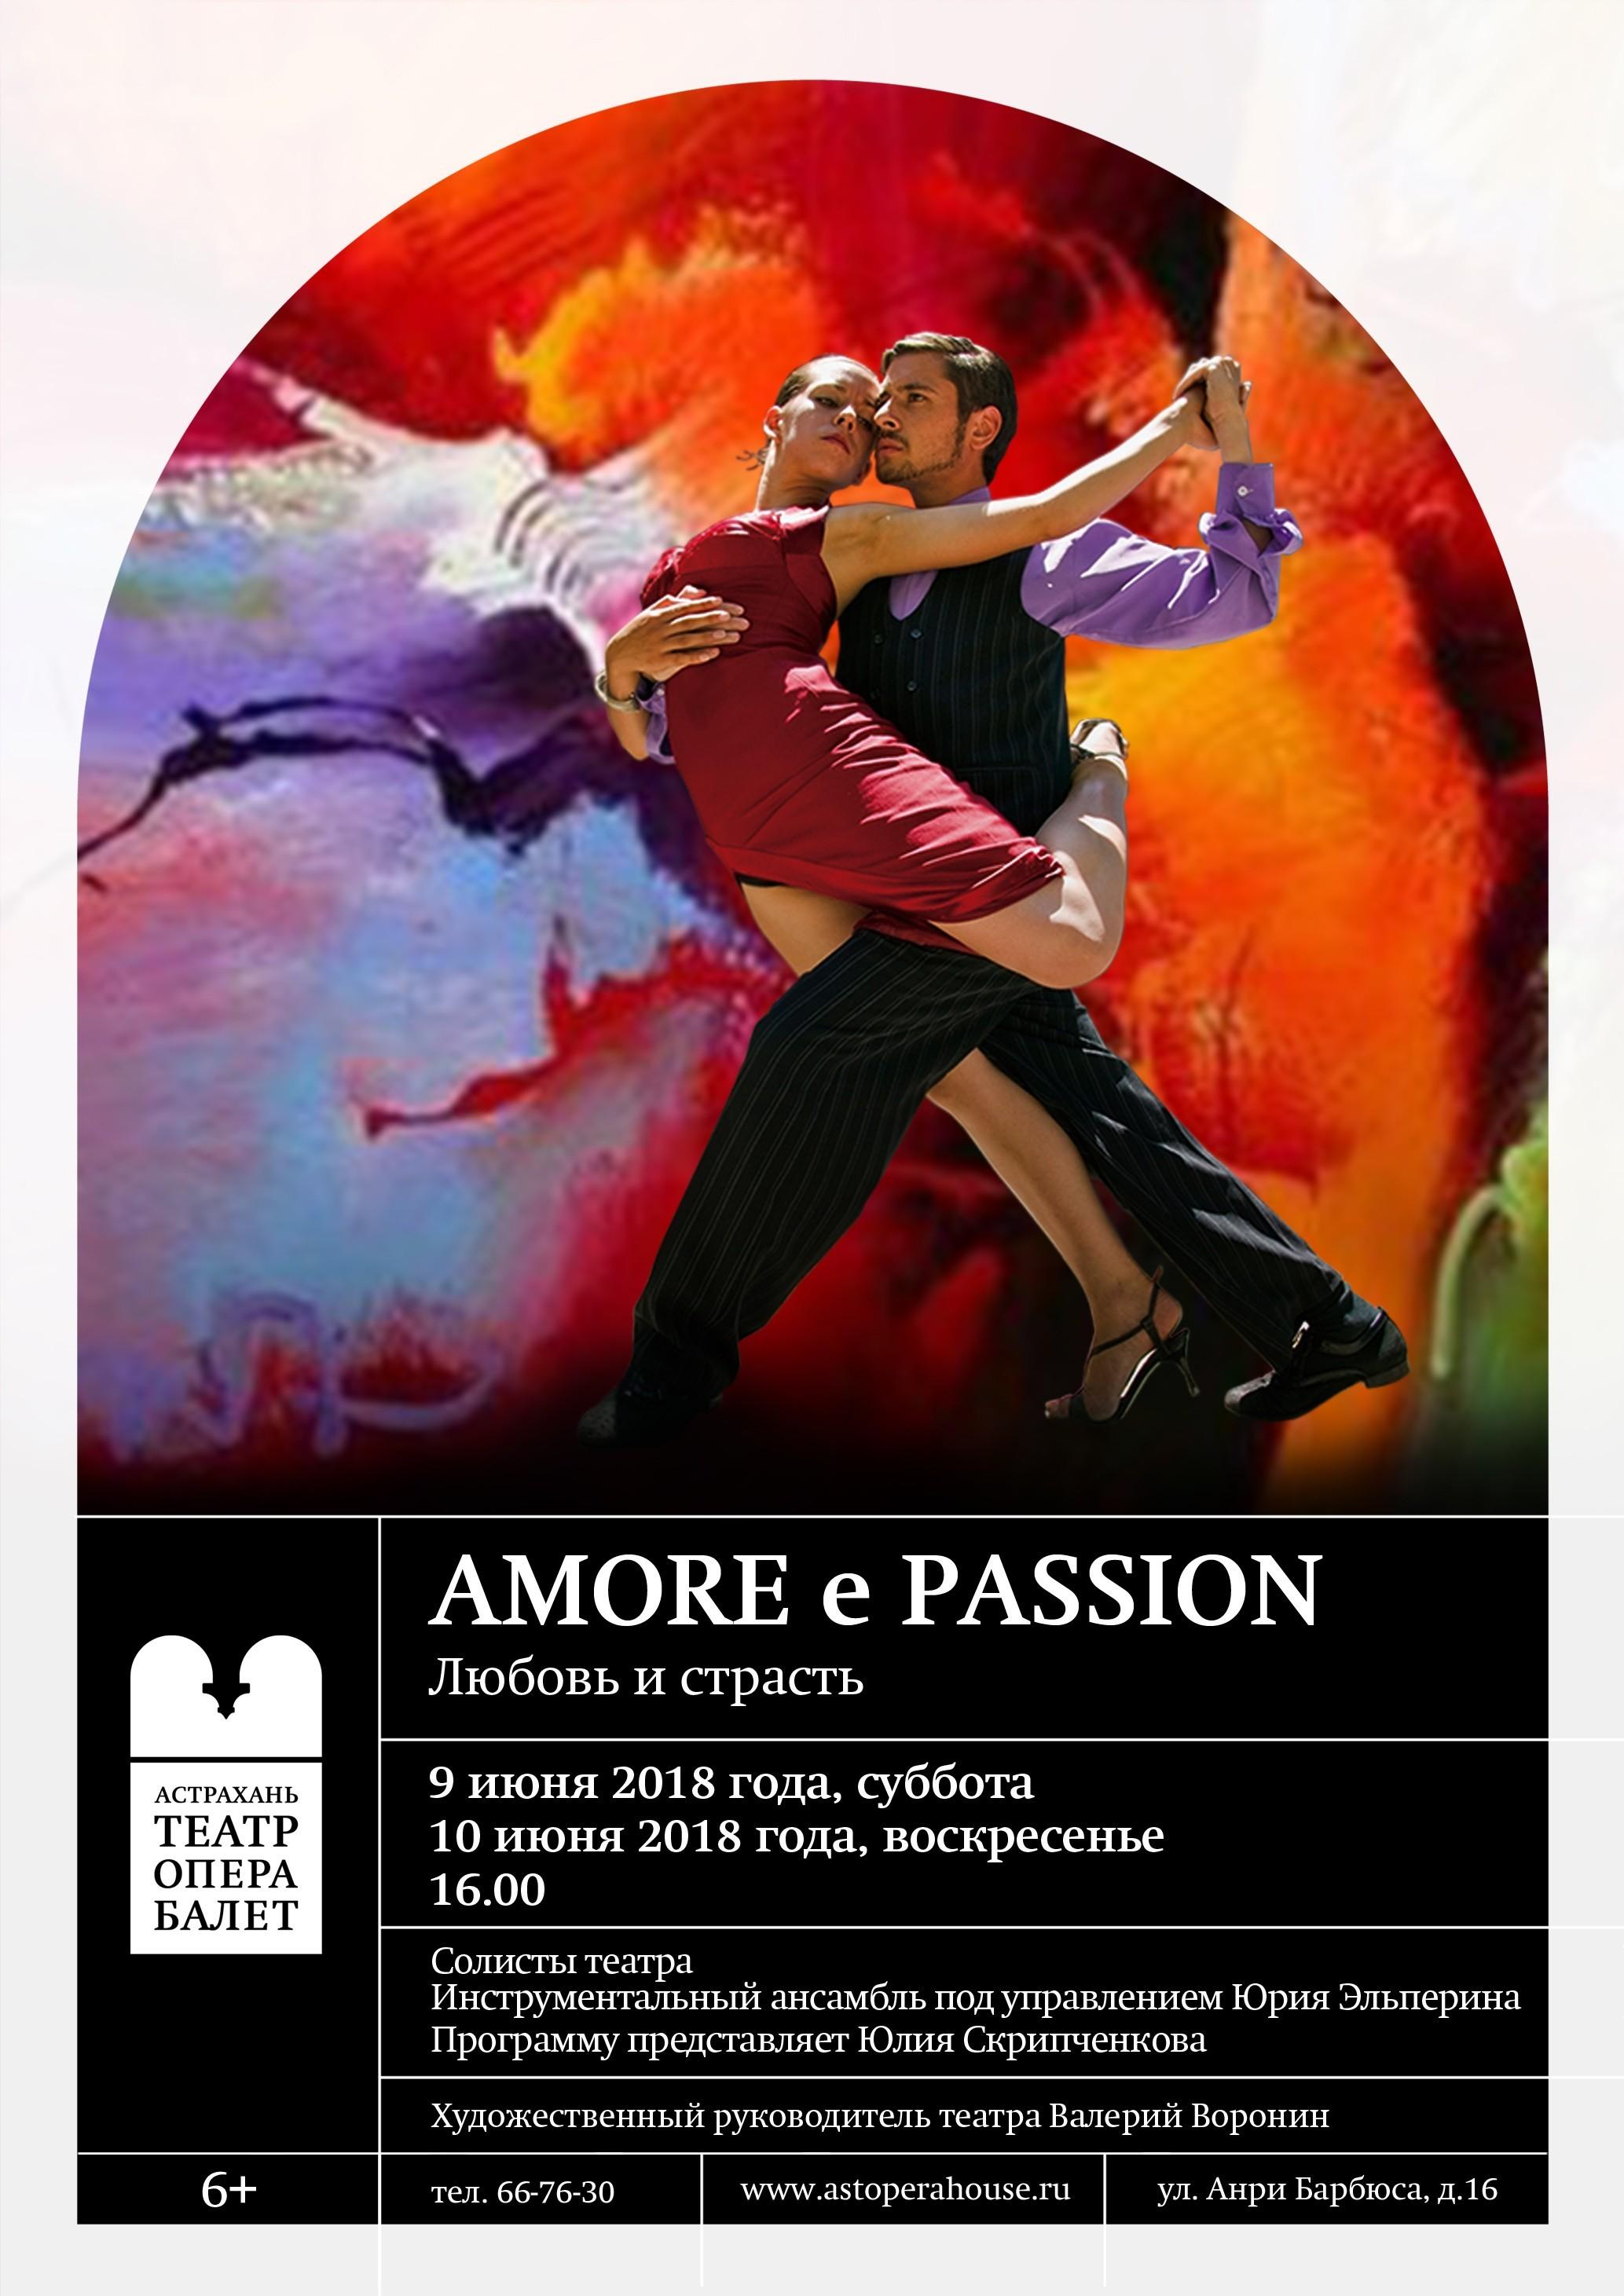 Новая концертная программа «Amore  passion»